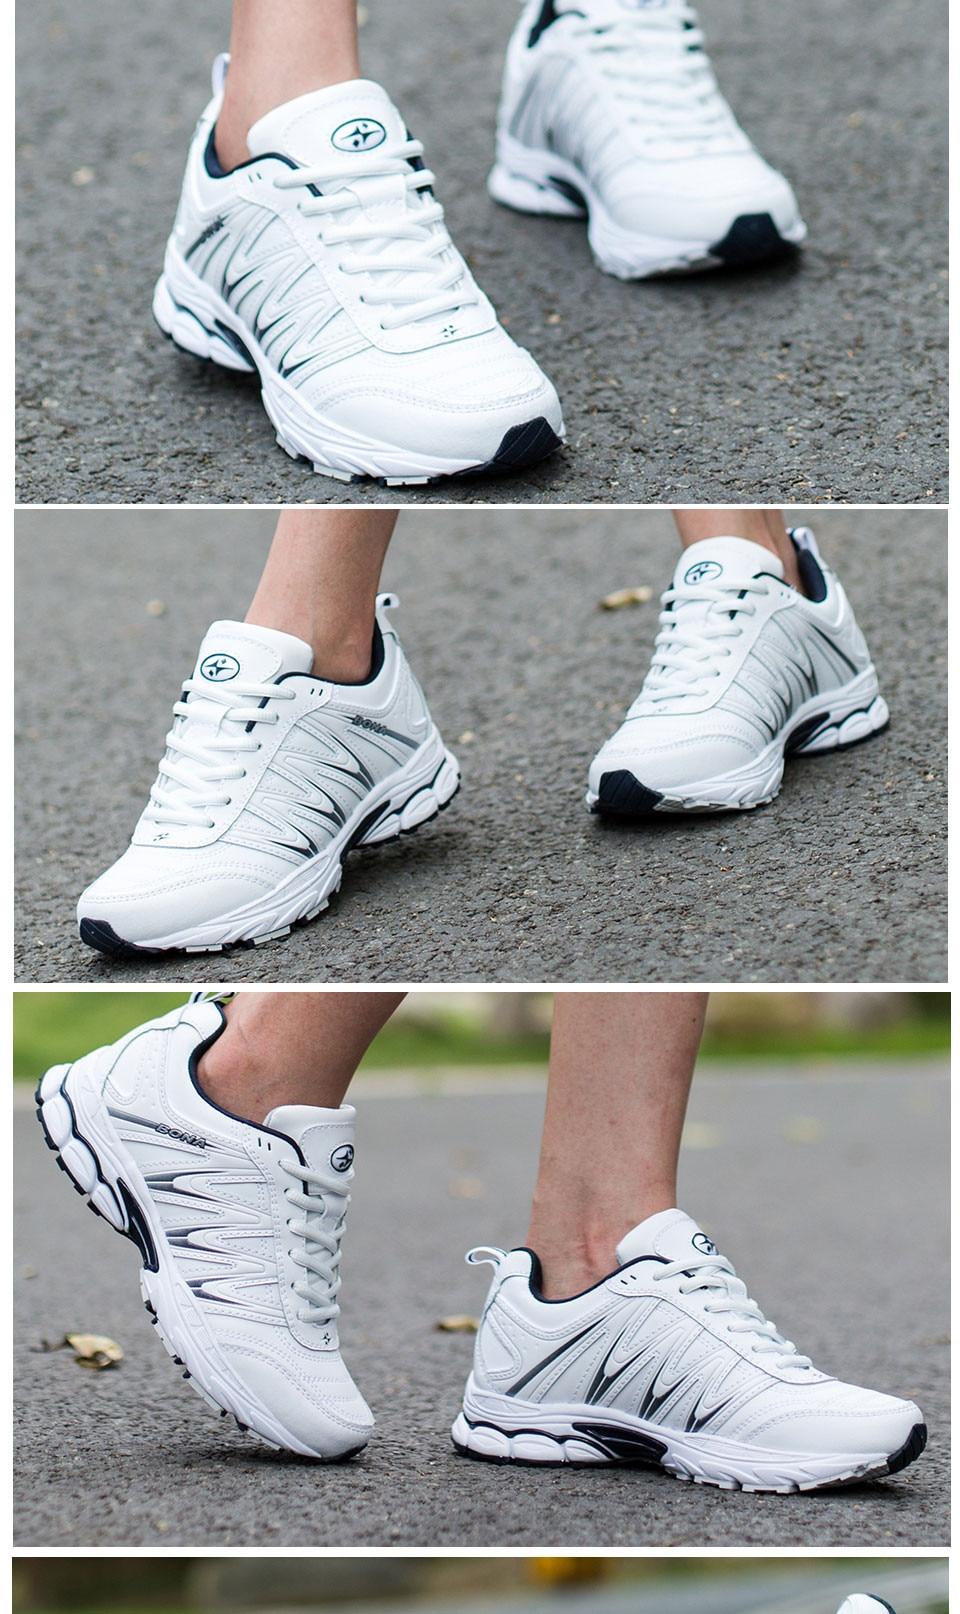 Ha33a5932802f4d1aa582154e40f5842fV BONA 2019 New Designers Casual Shoes Men Style Cow Split Sneakers Male Lightweight Outdoor Fashion Footwear Man Trendy Comfy